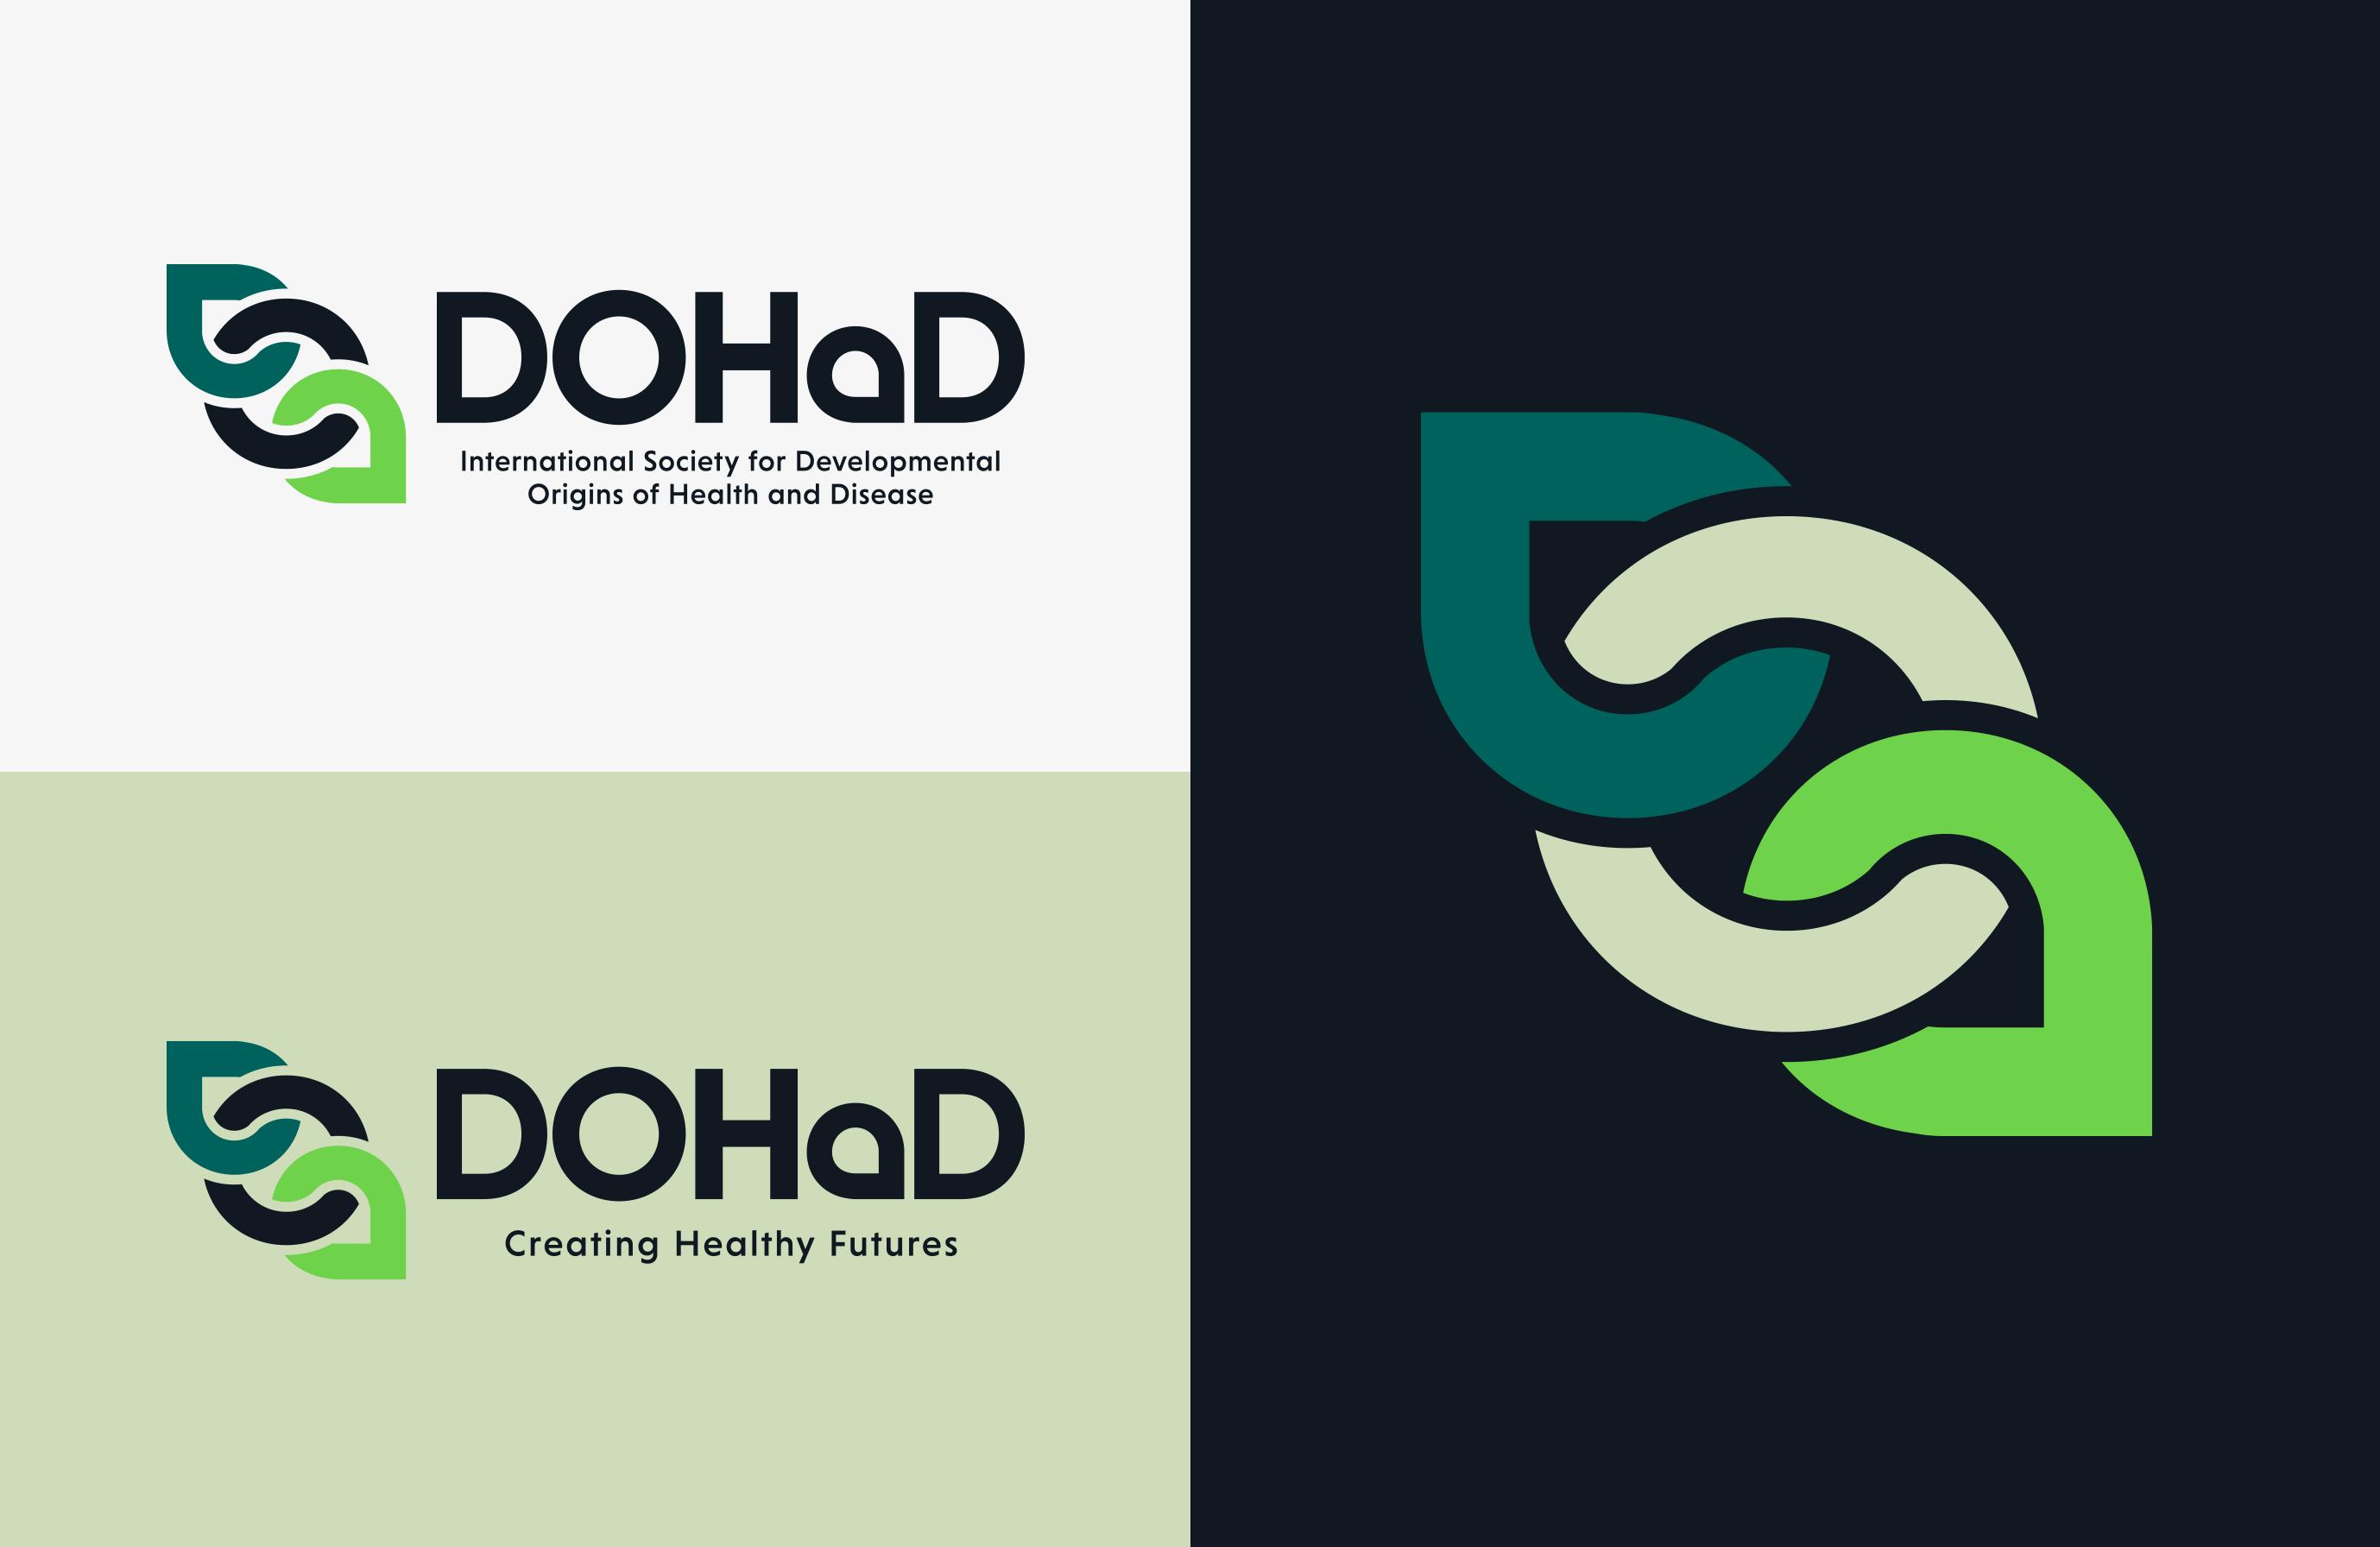 DOHaD-branding